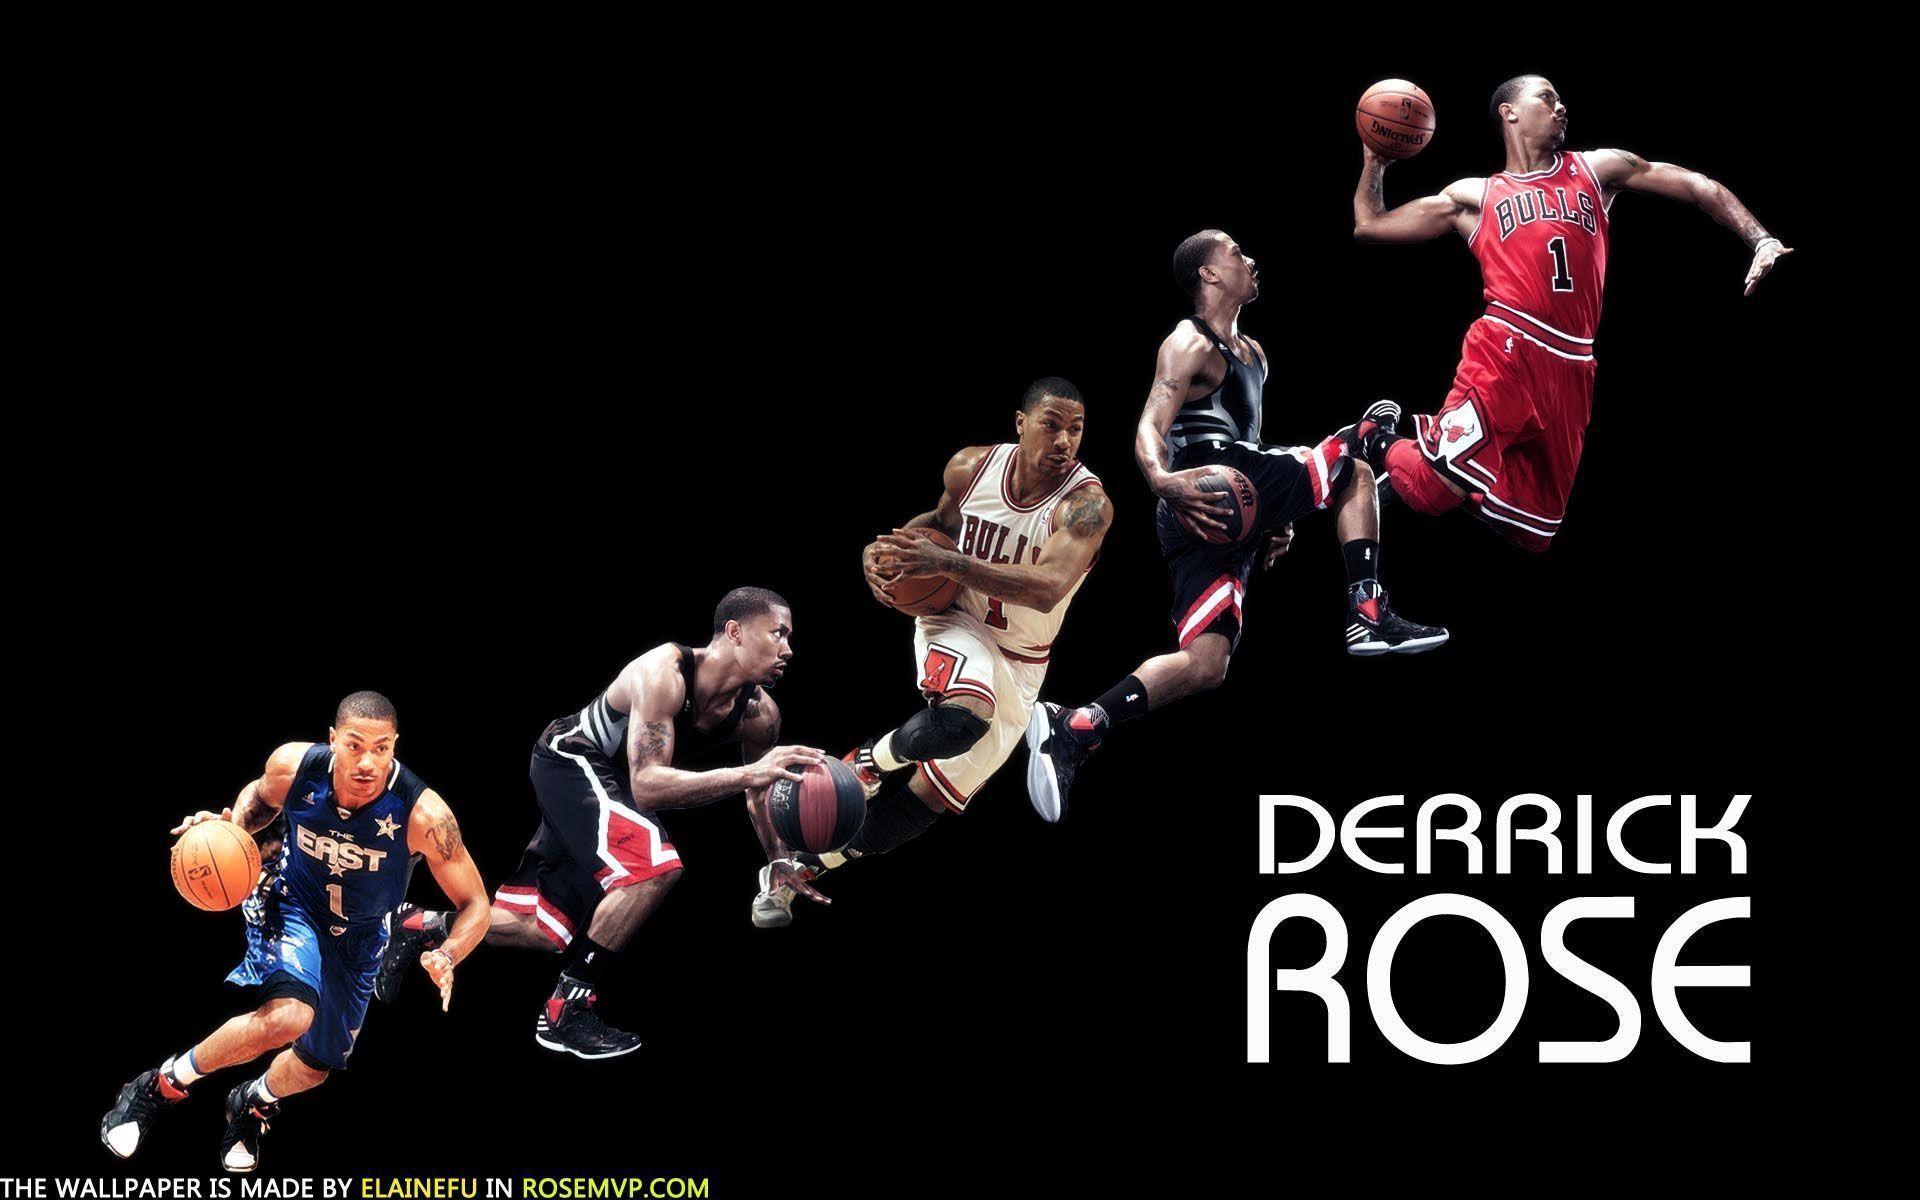 Derrick Rose Logo Wallpapers 1920x1200